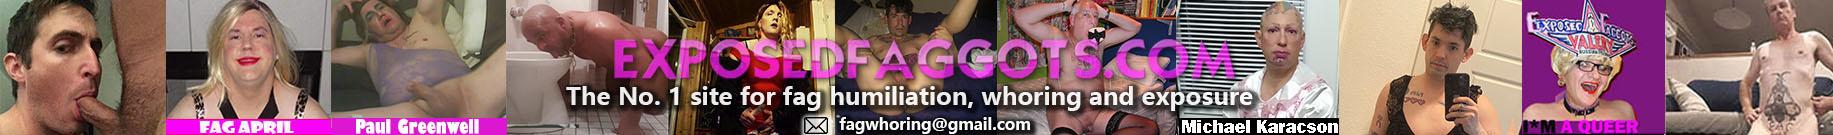 Exposedfaggots.com